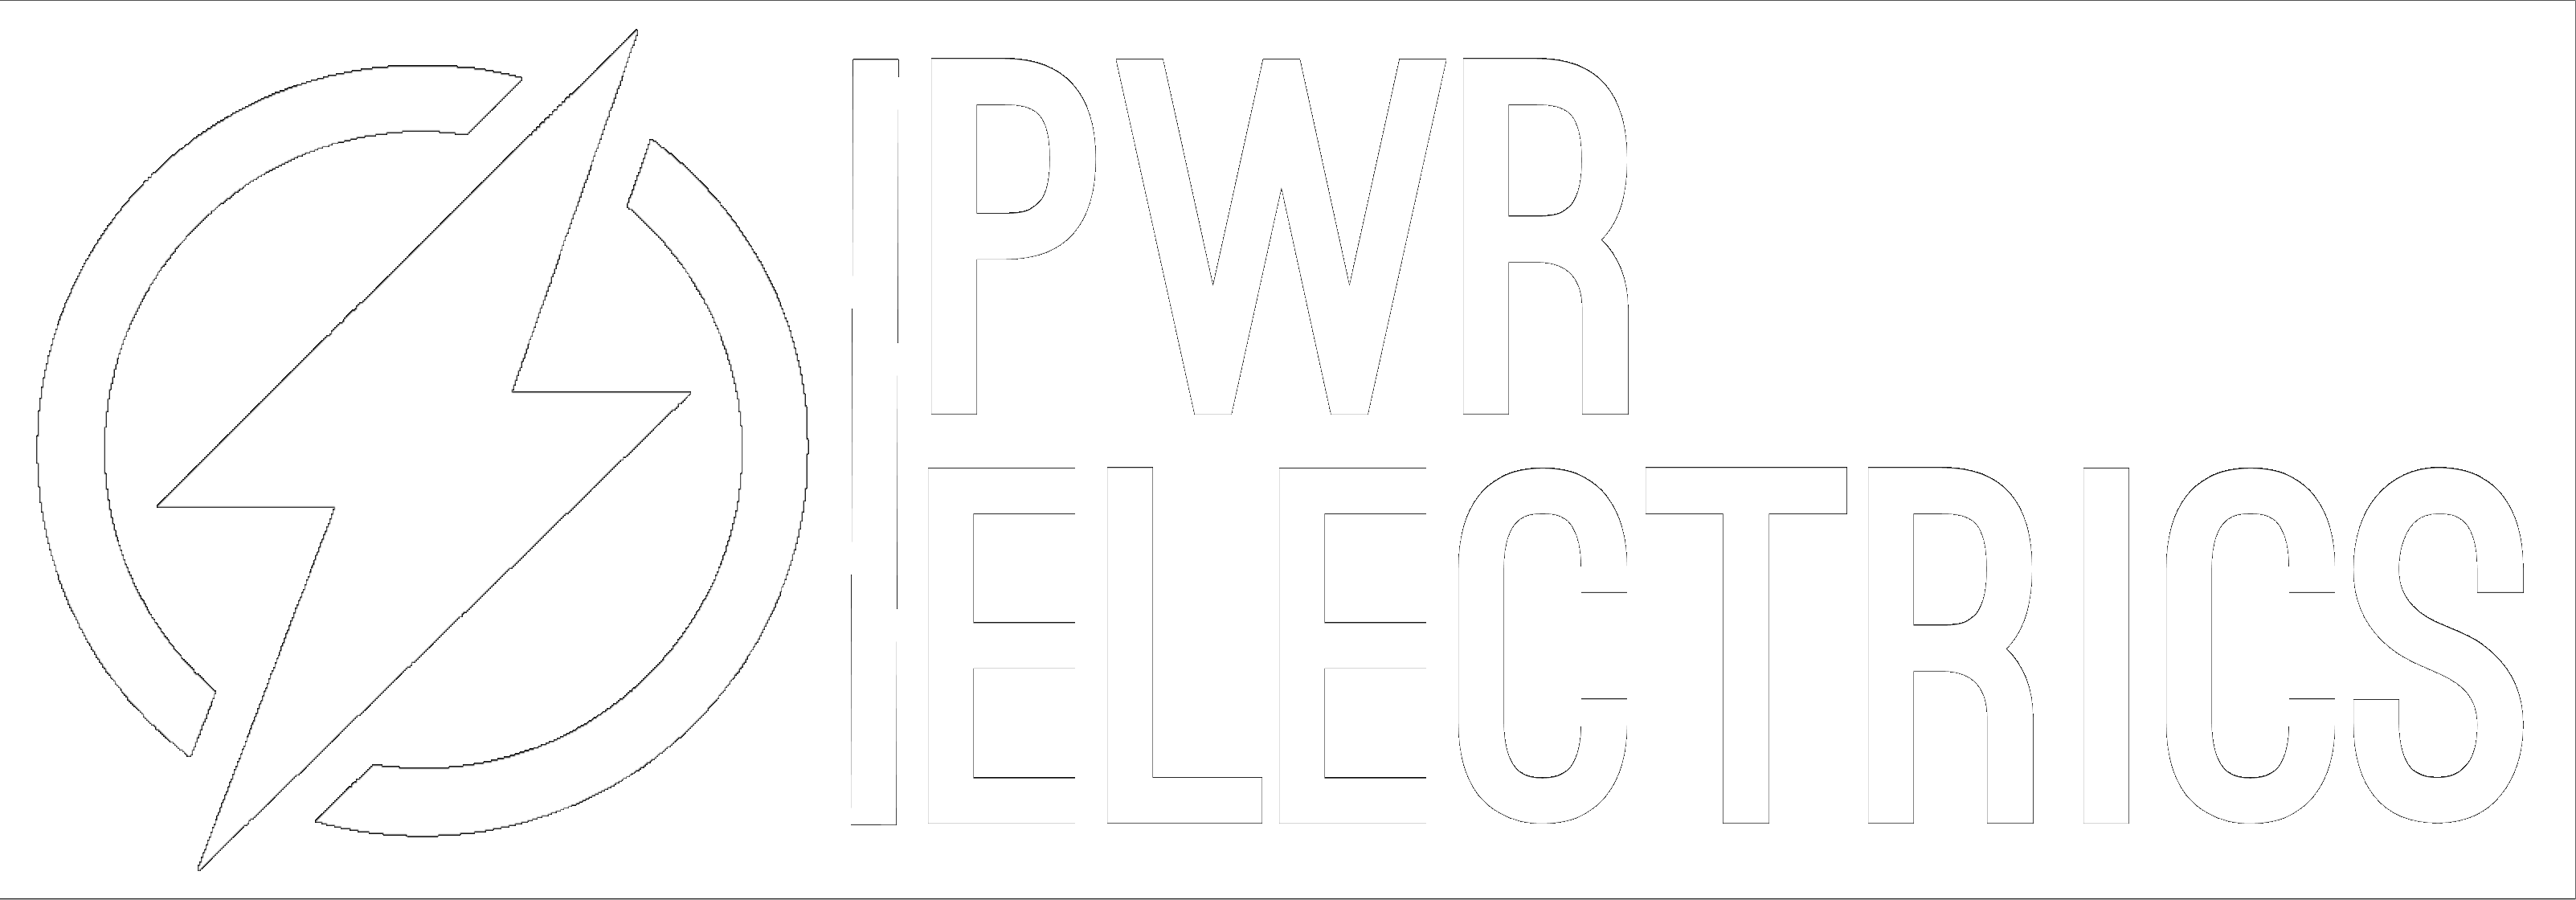 PWR Electrics